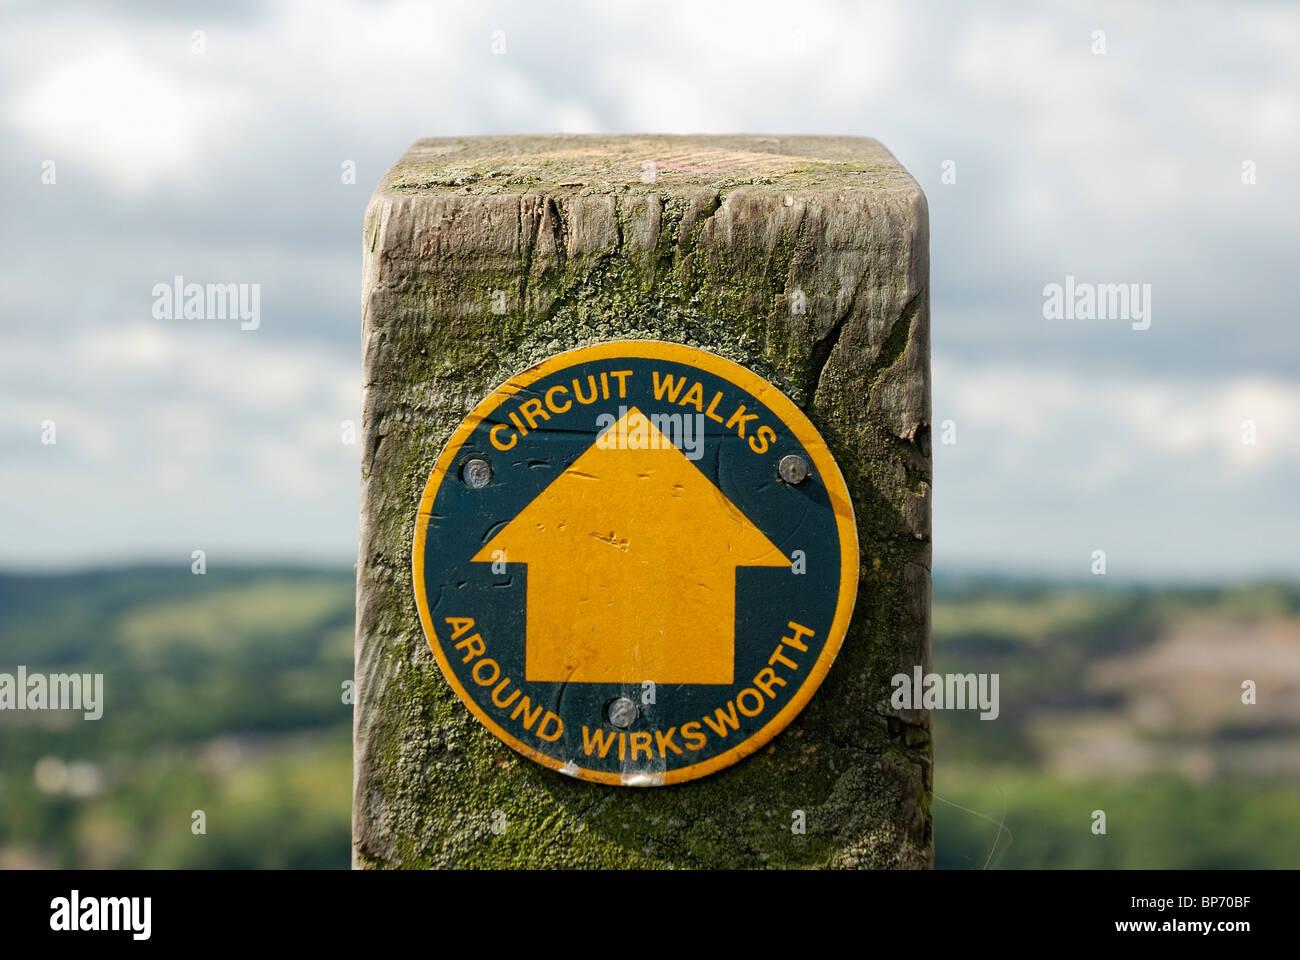 circuit walks sign Wirksworth Derbyshire england uk - Stock Image